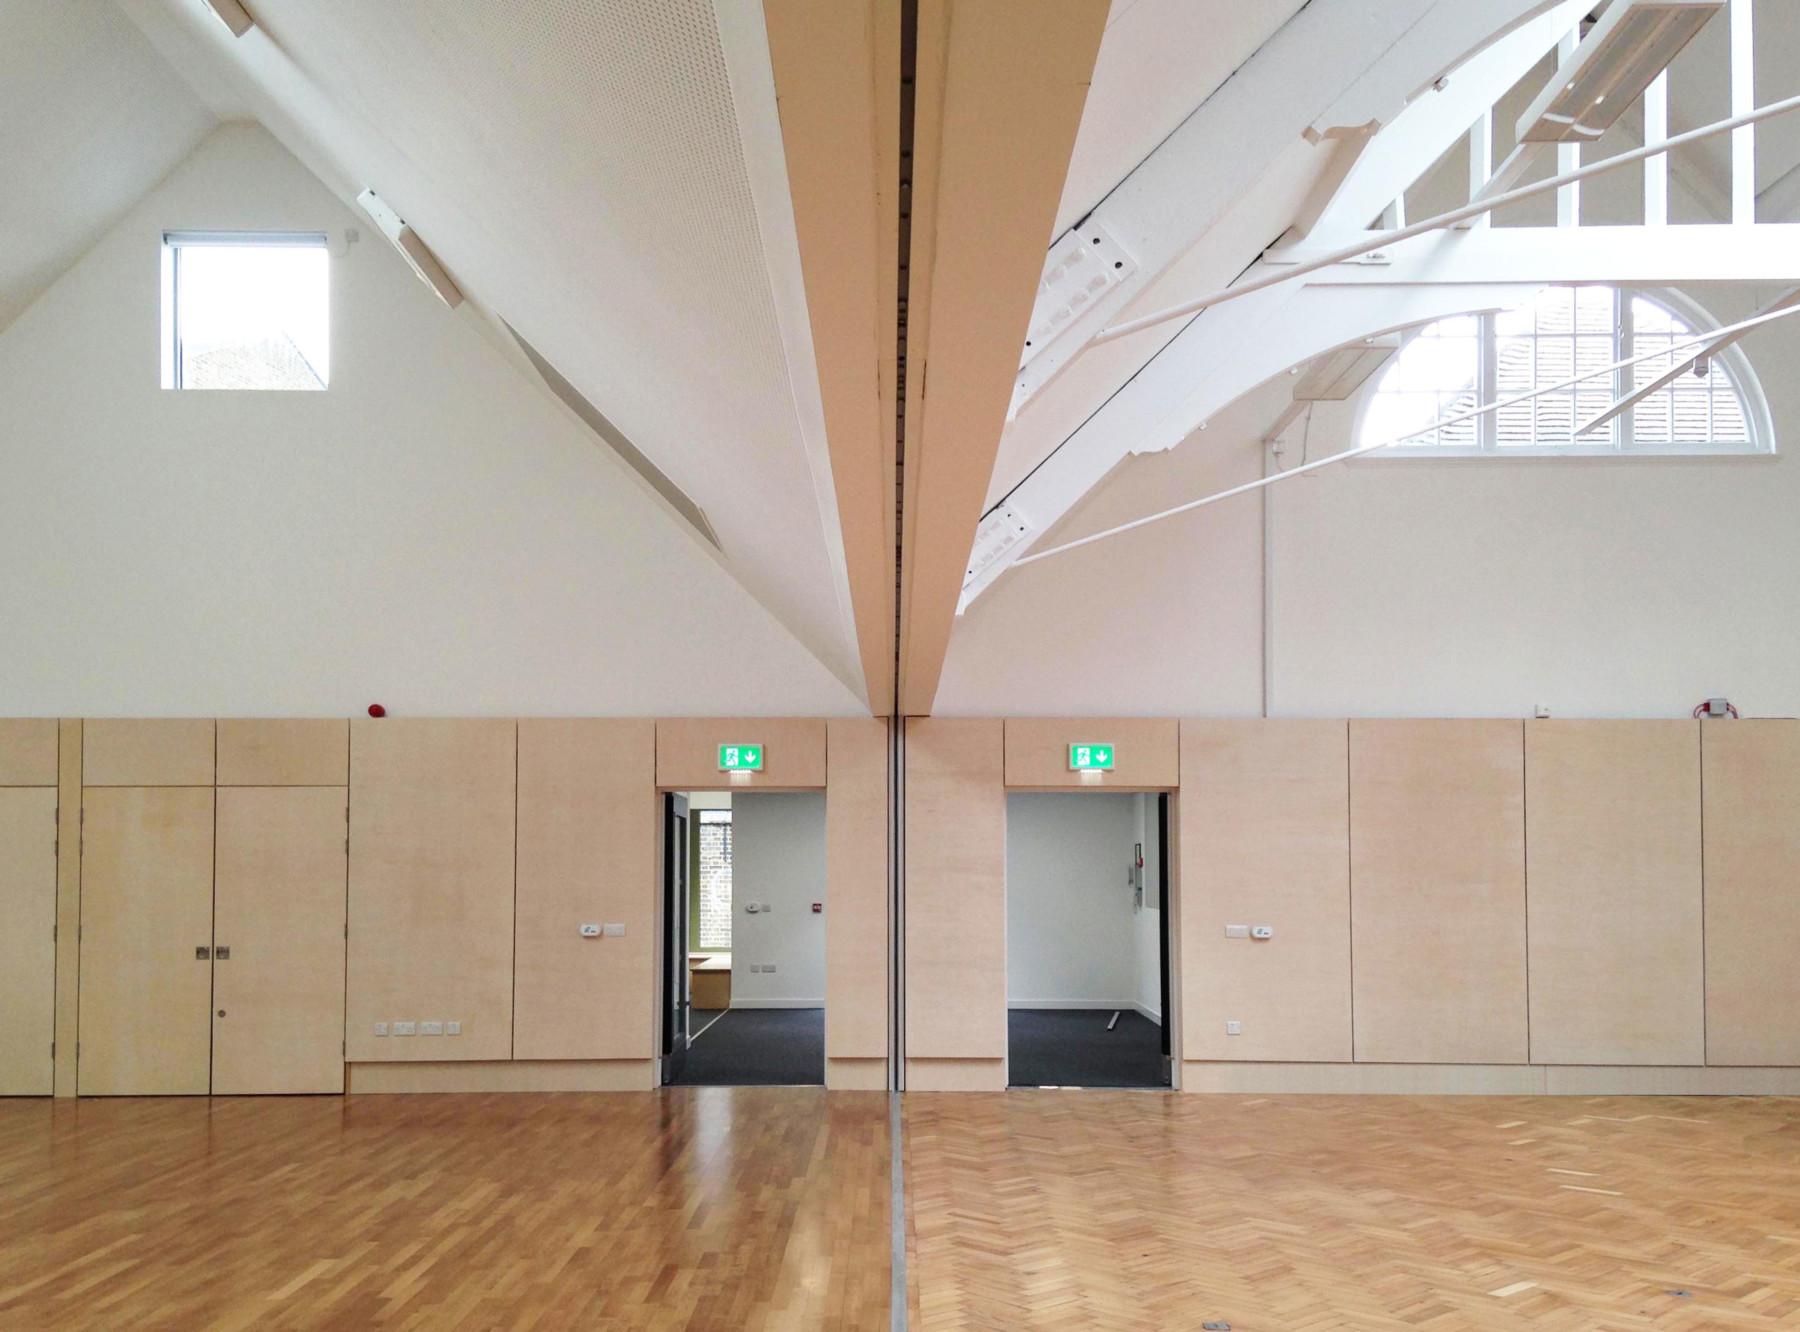 Sarah-Wigglesworth-Architects Kingsgate School hall 3600